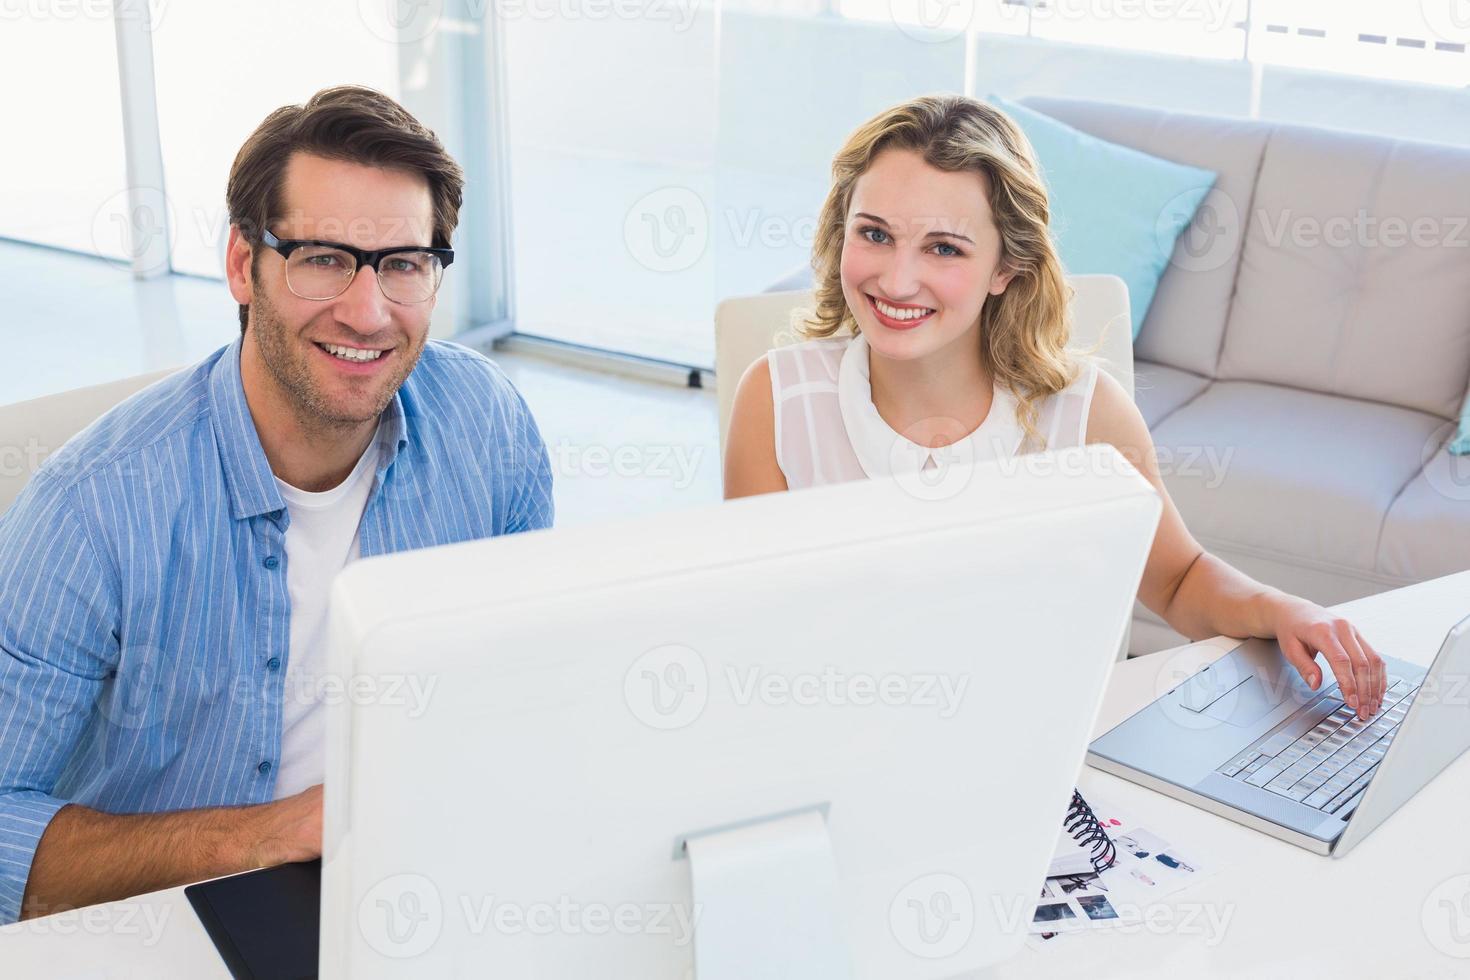 editores de fotos alegres trabalhando juntos na mesa digitalizadora